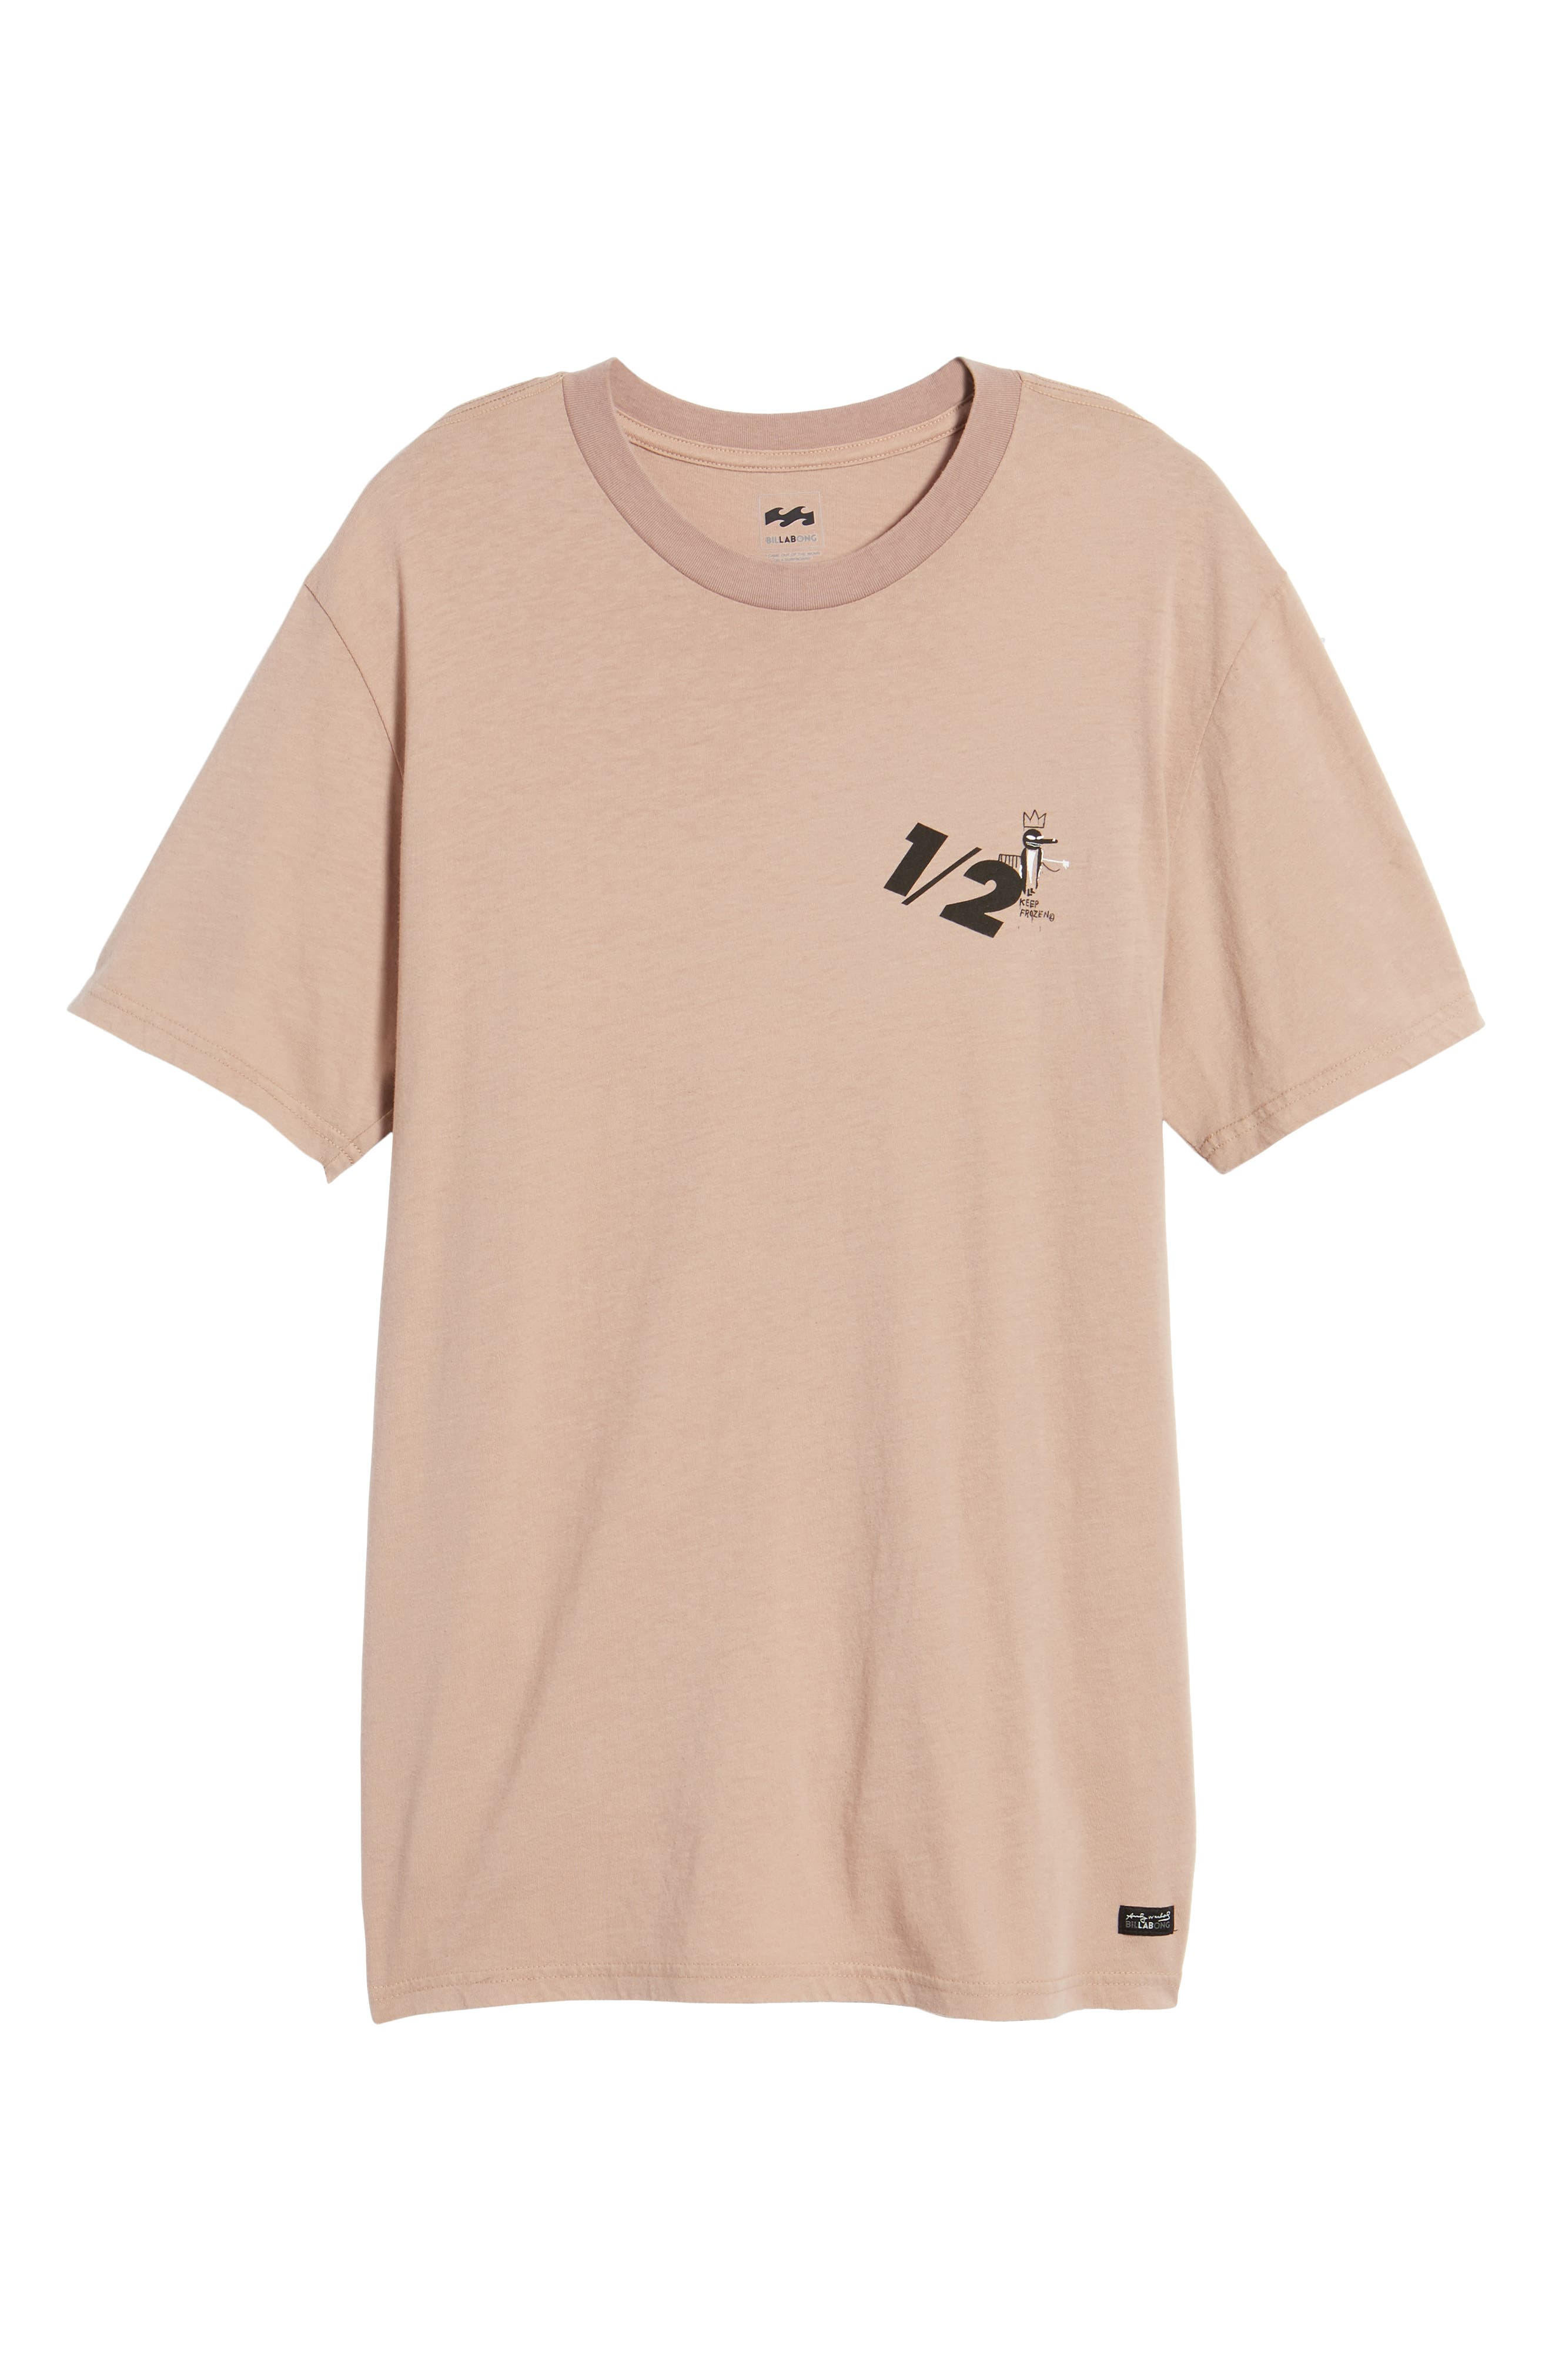 x Warhol Half T-Shirt,                             Alternate thumbnail 6, color,                             Ash Rose